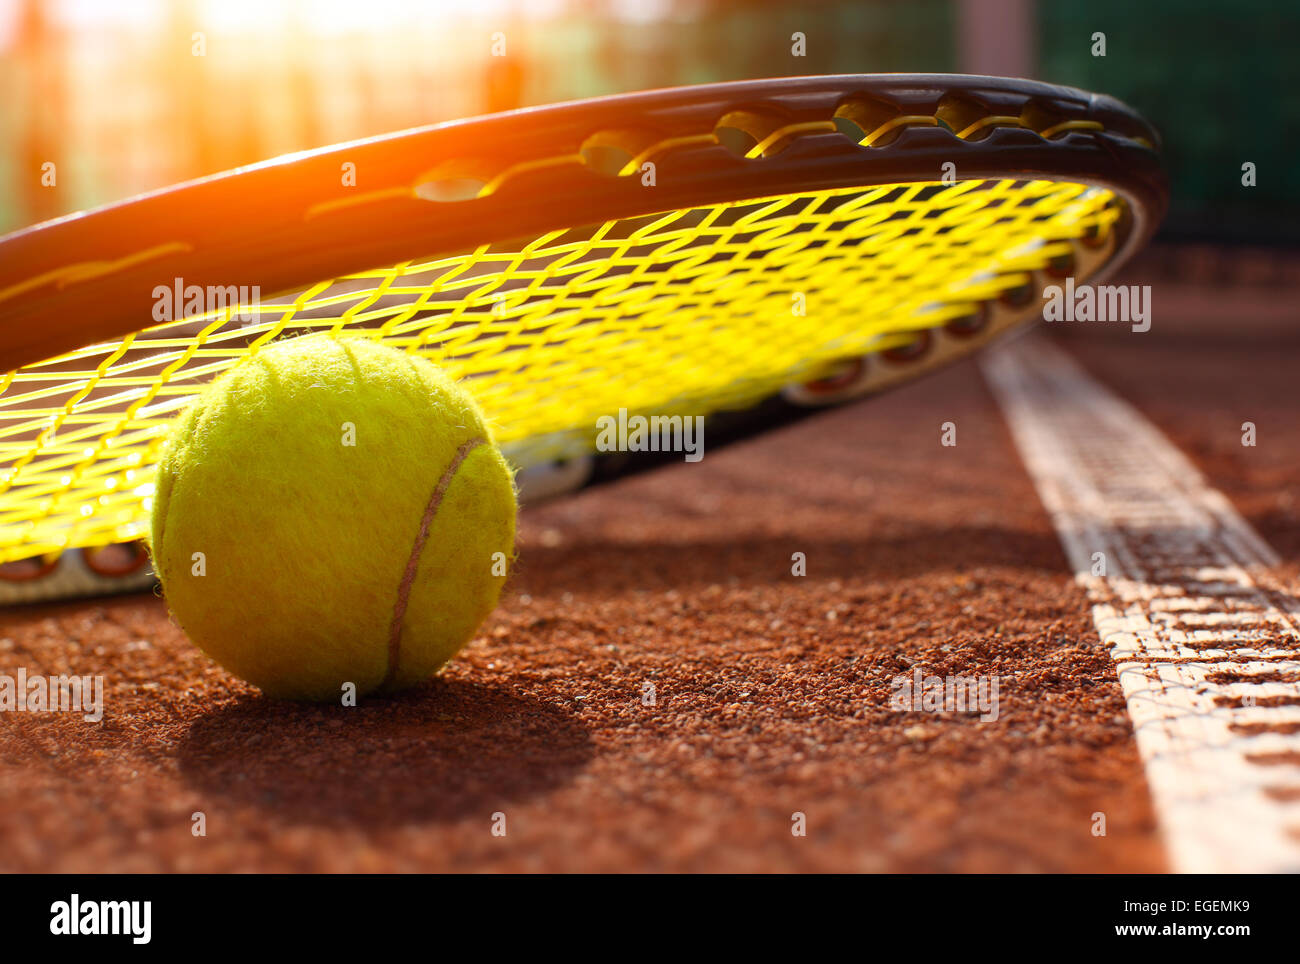 tennis ball on a tennis court - Stock Image